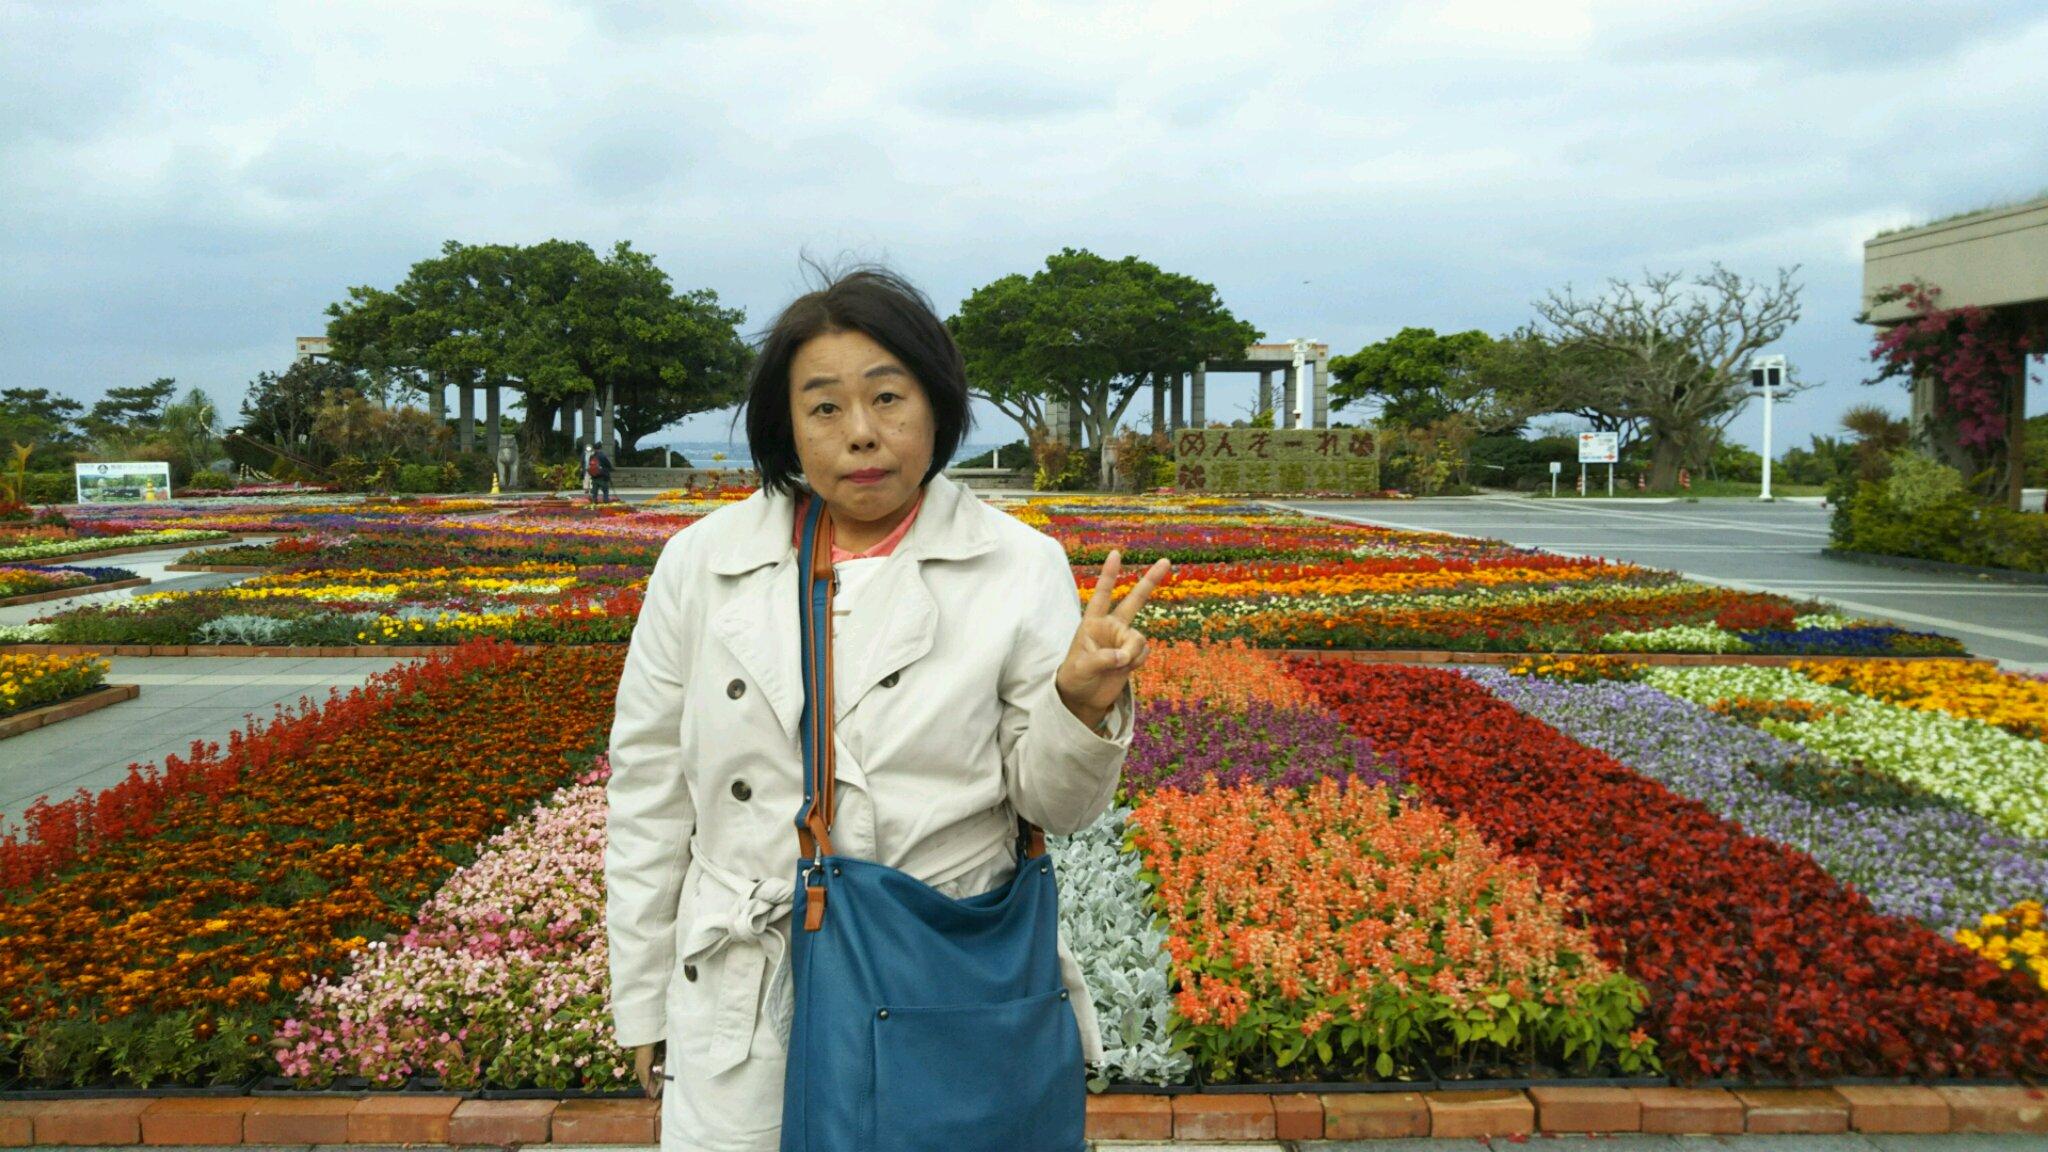 http://salut.her.jp/blog/images/ohanabatake.JPG